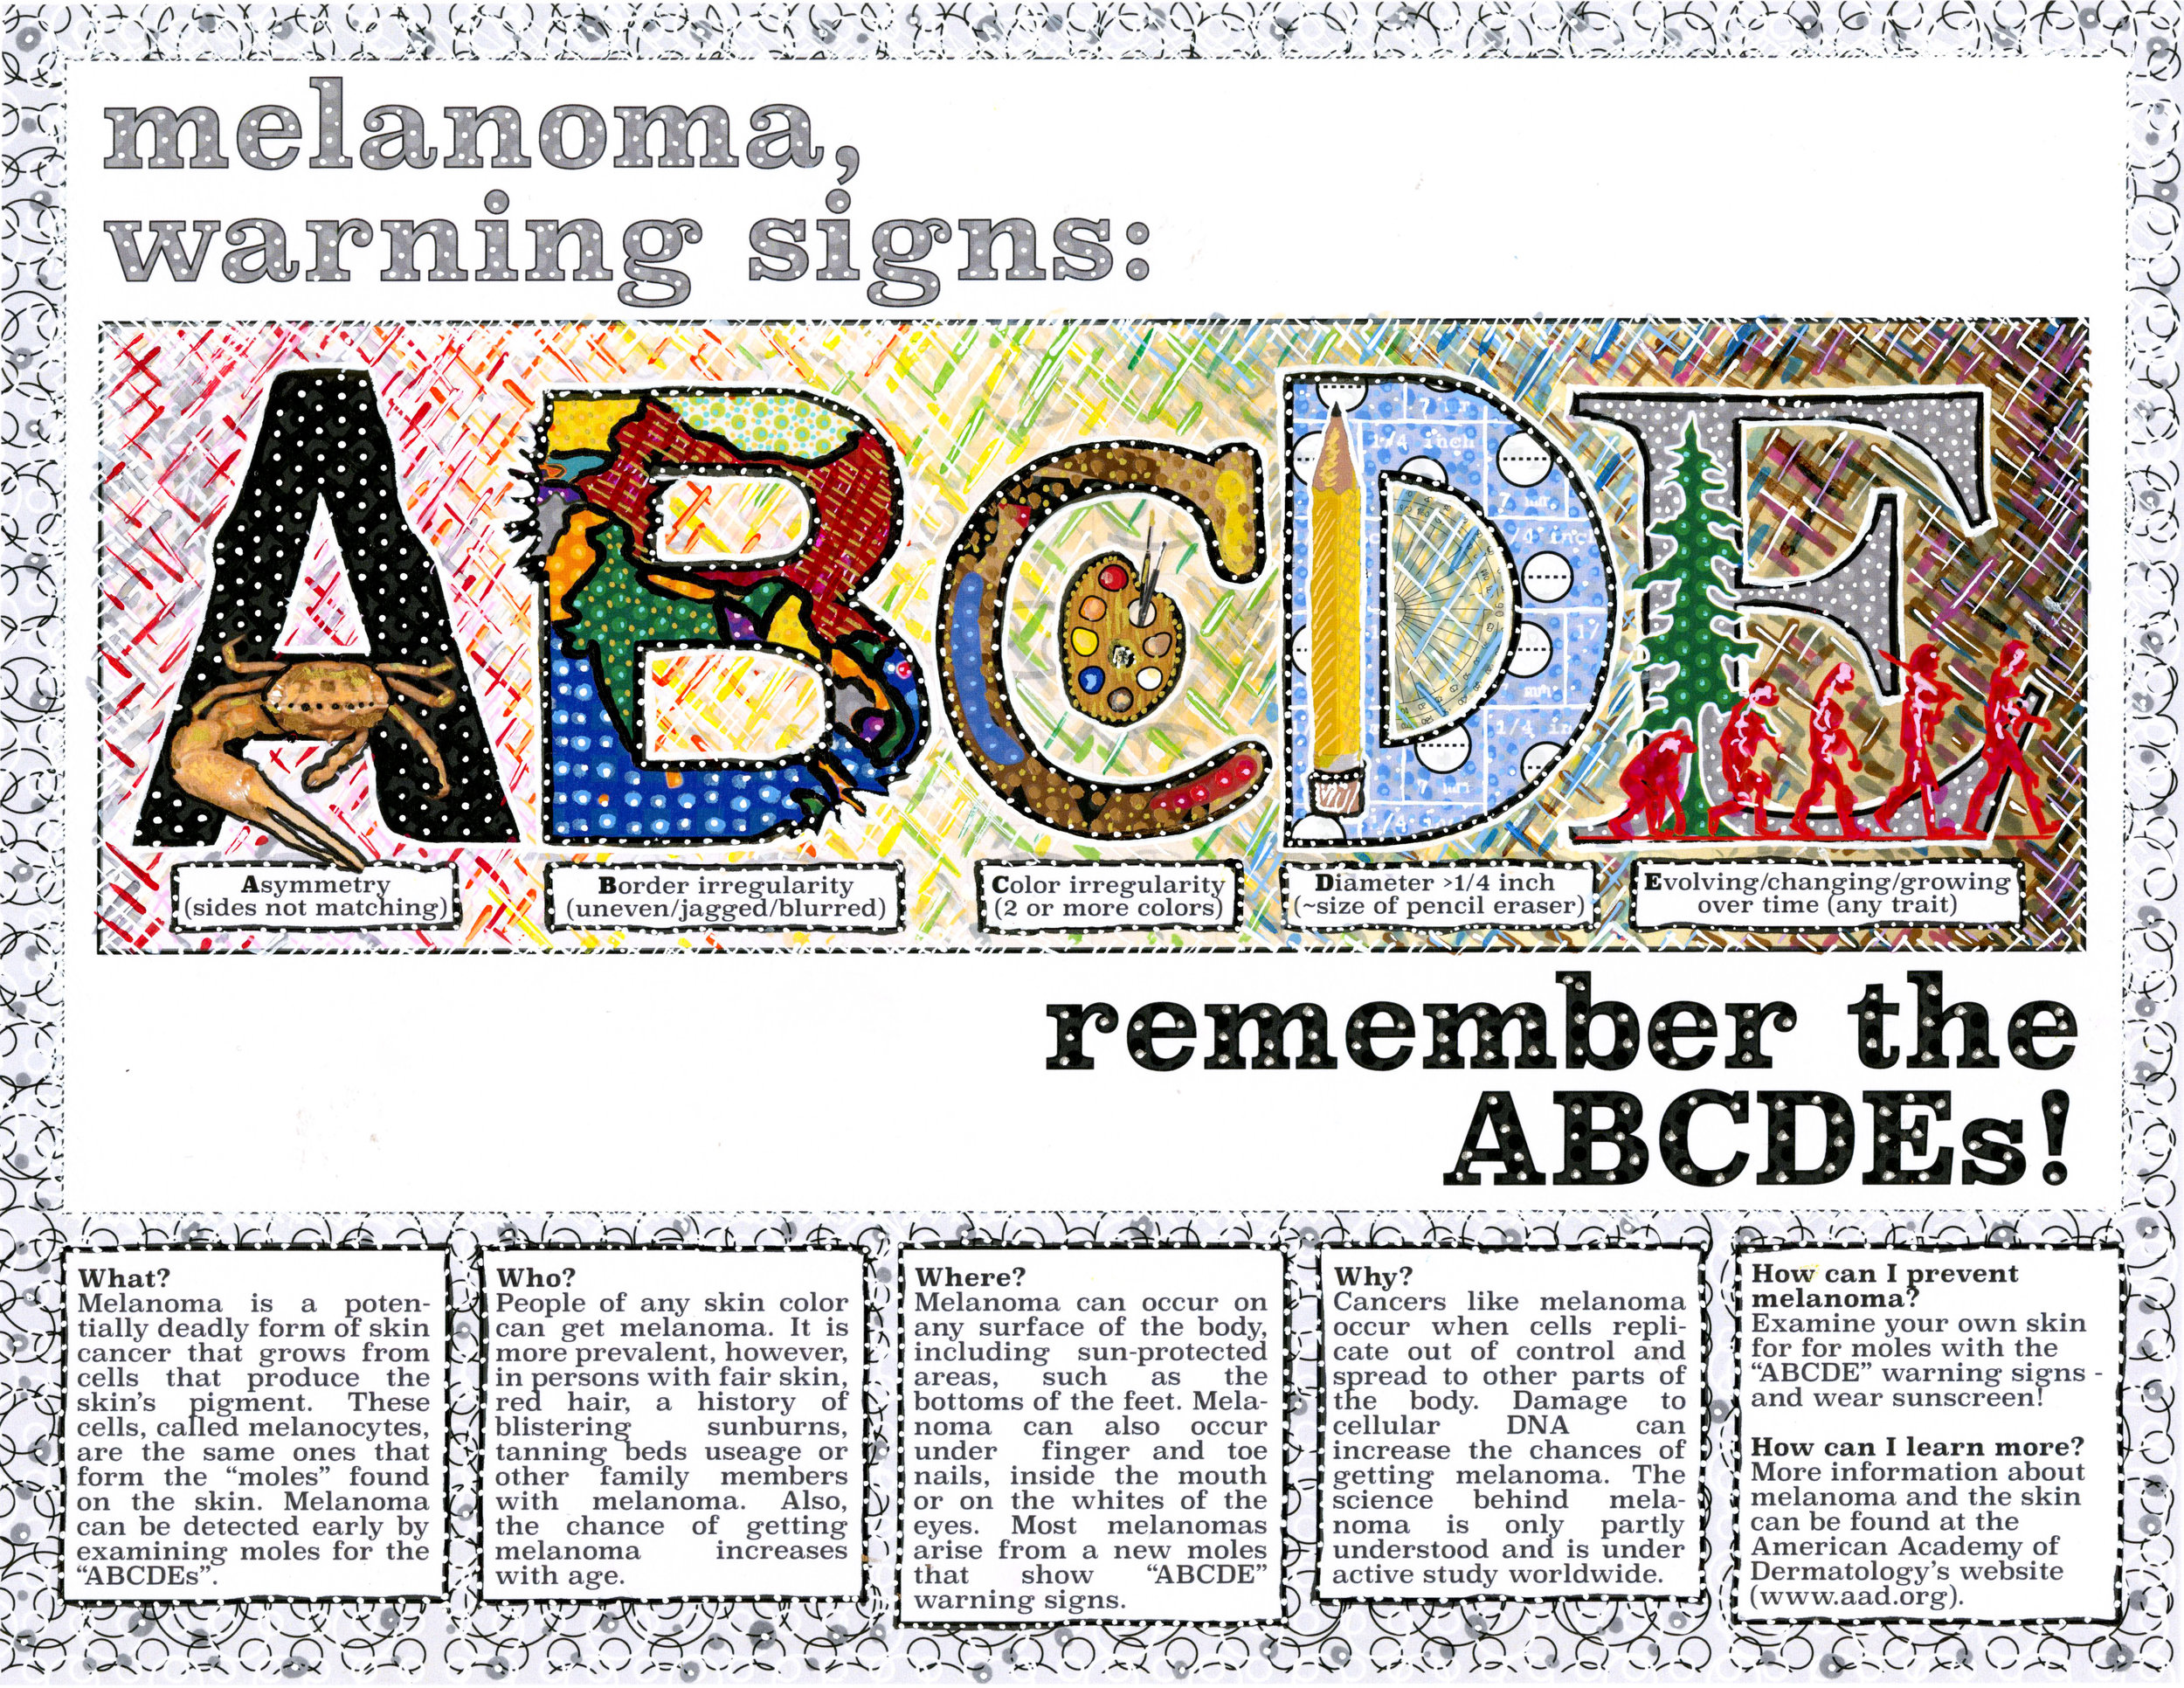 ABCDE melanoma handout front side.jpg